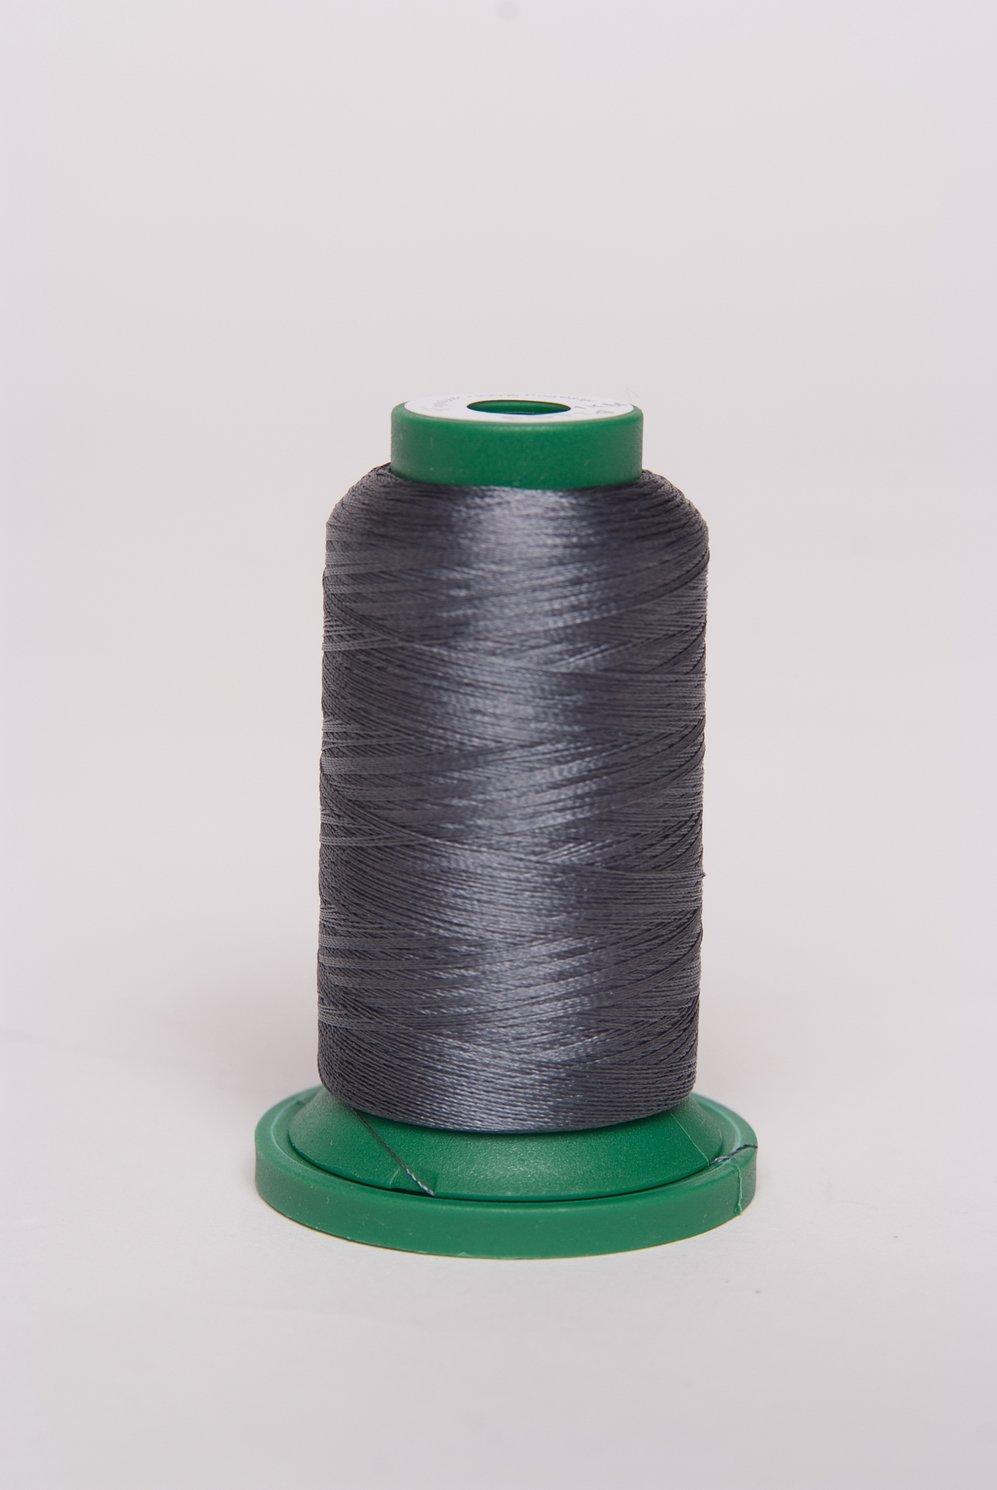 Grey - ES114 - Exquisite Embroidery Thread - 1000 meters